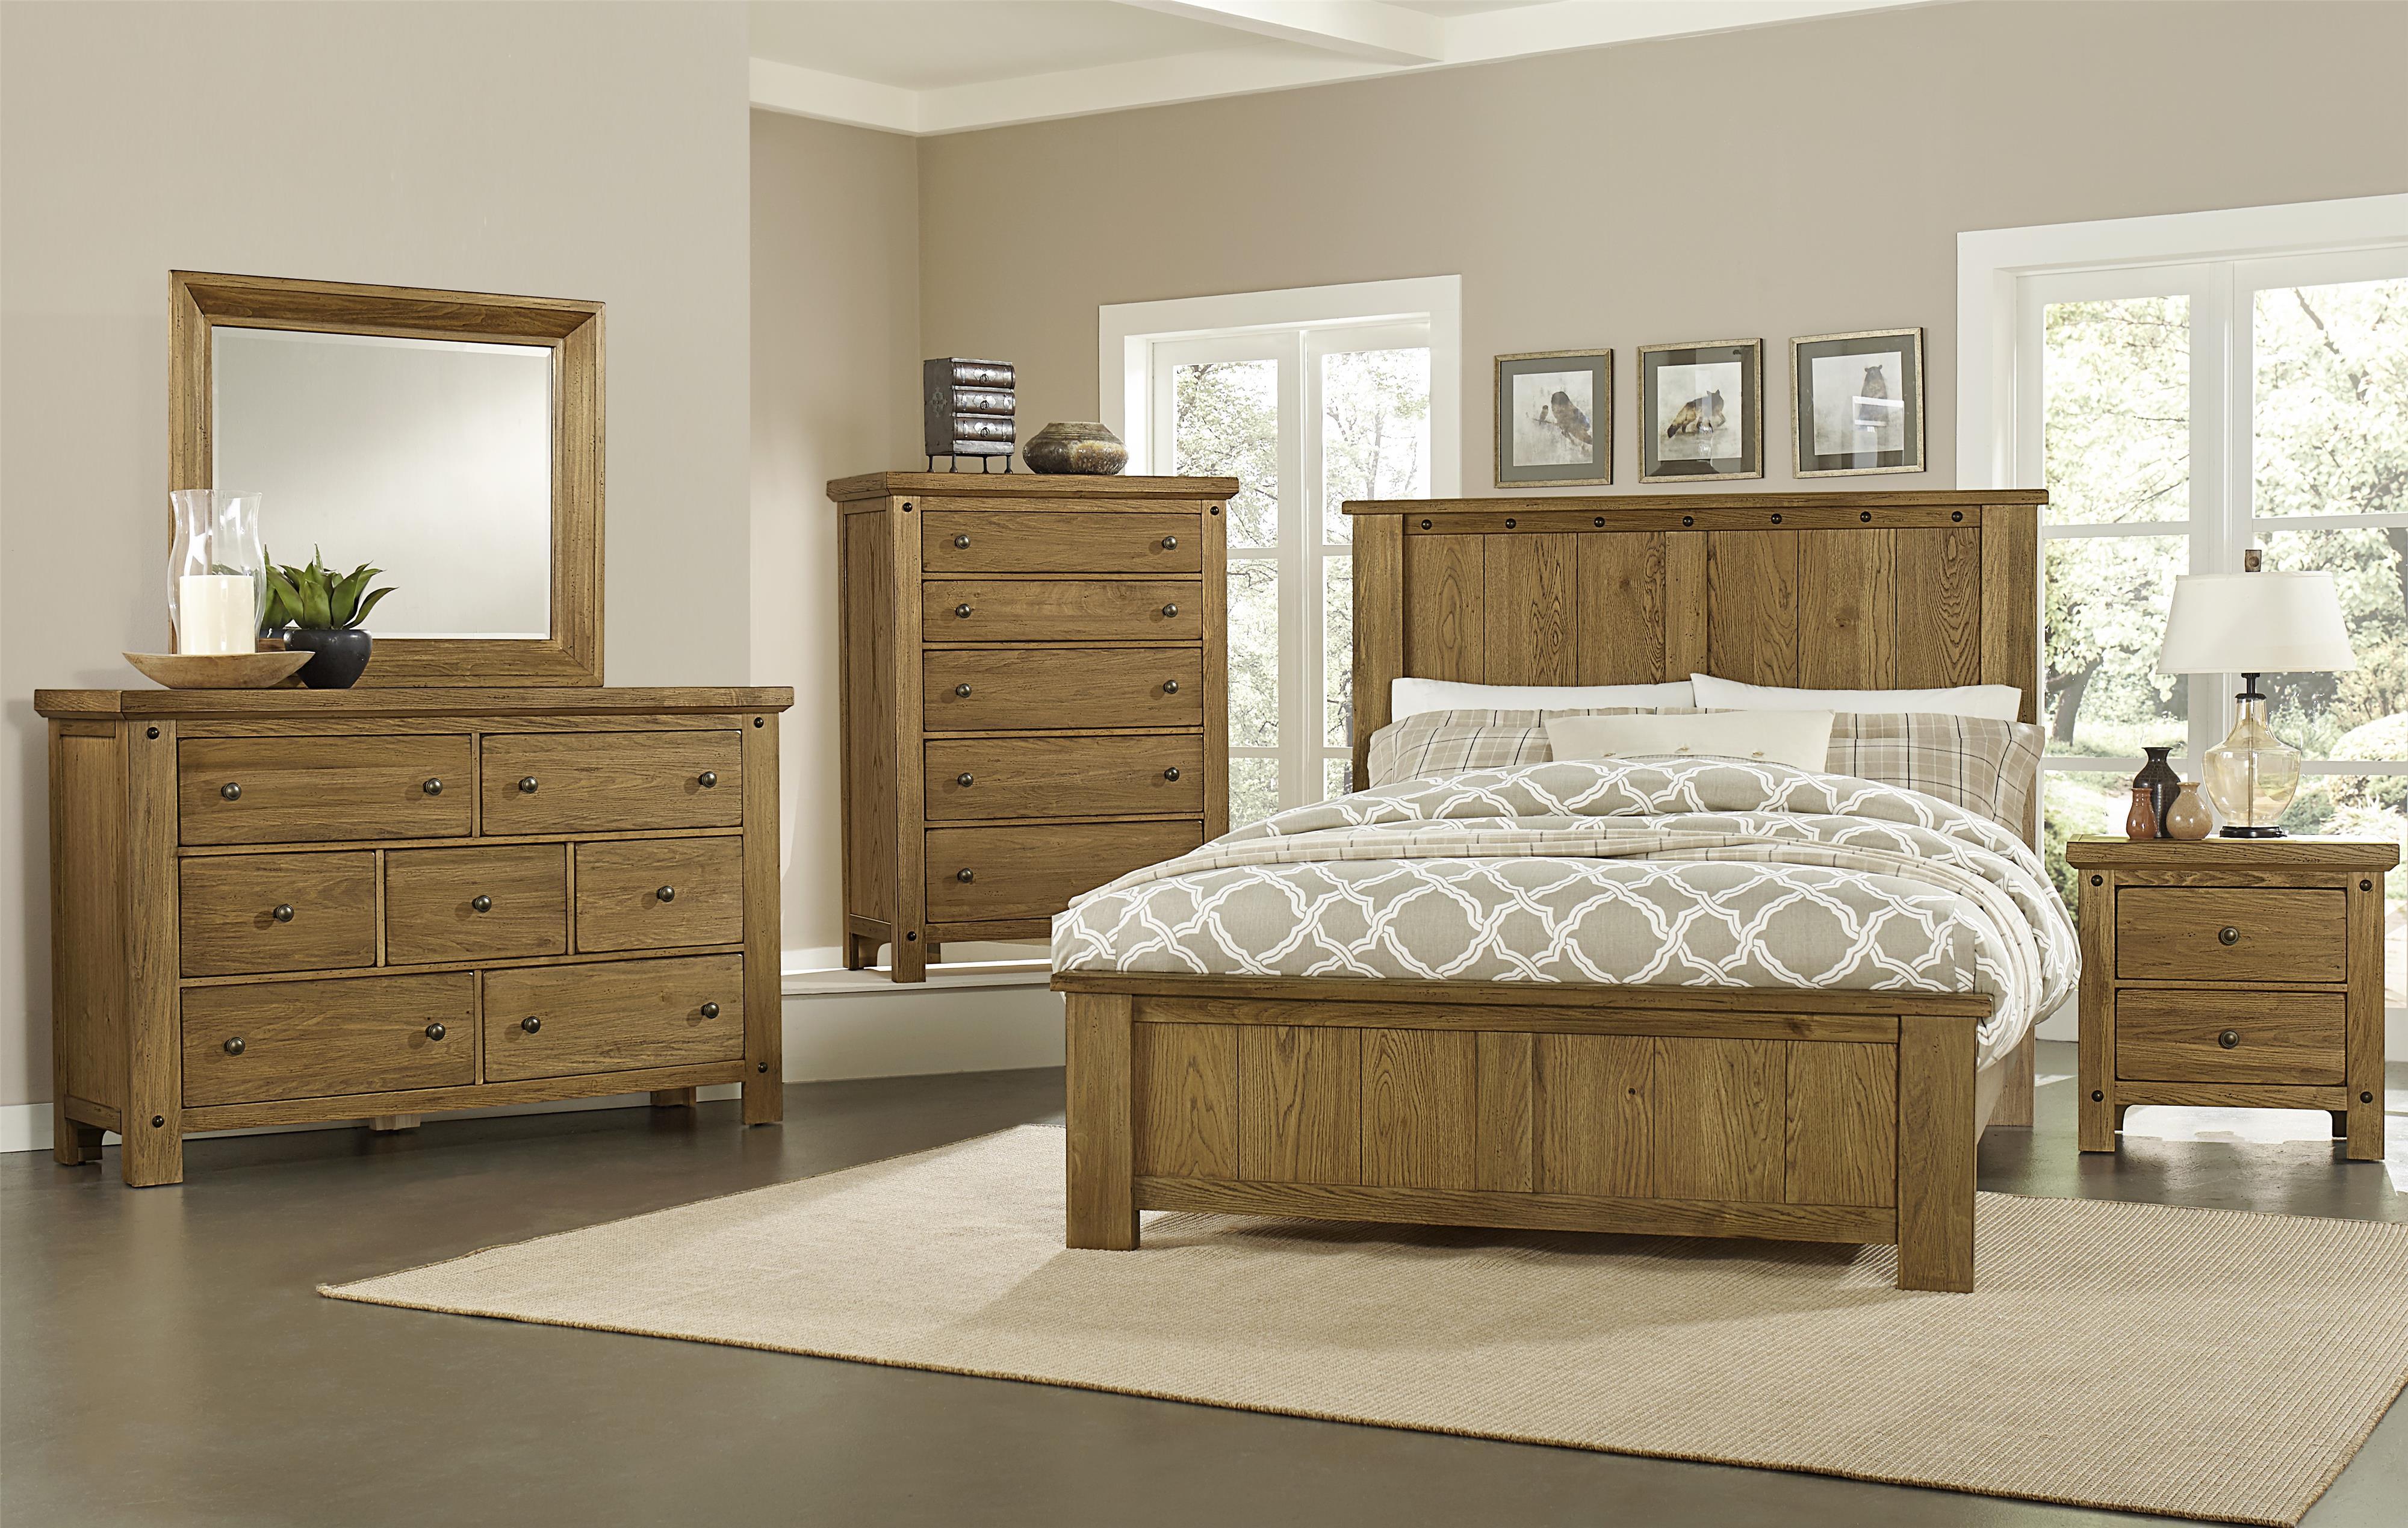 Vaughan Bassett Collaboration King Bedroom Group - Item Number: 614 K Bedroom Group 1